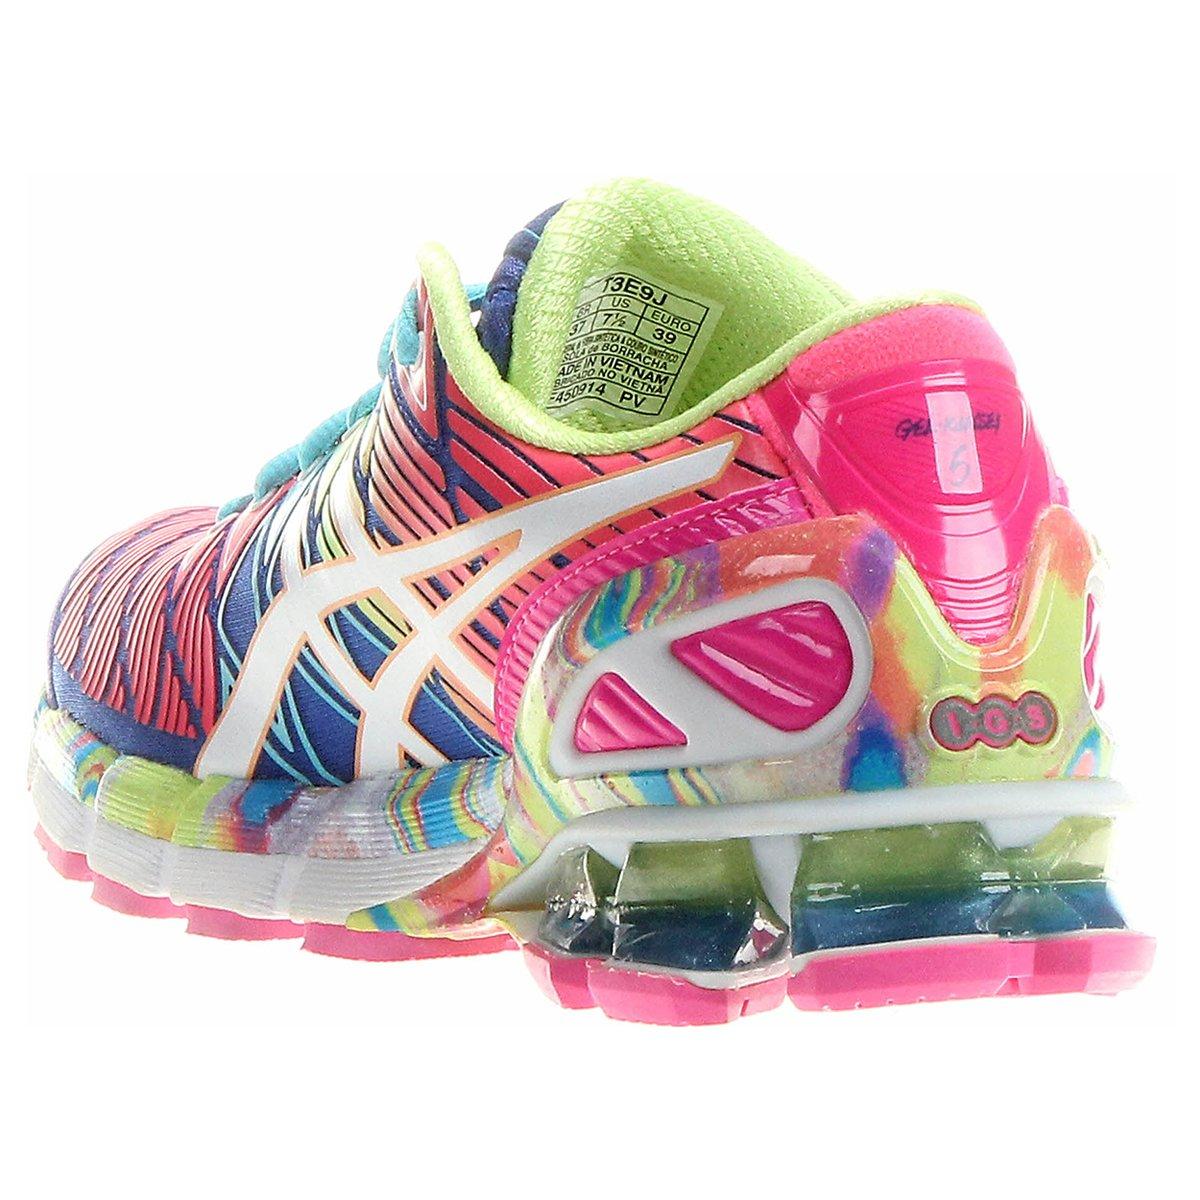 7810a0601af32 Tnis Asics Gel Kinsei 5 Verde Claro e Pink Netshoes tnis